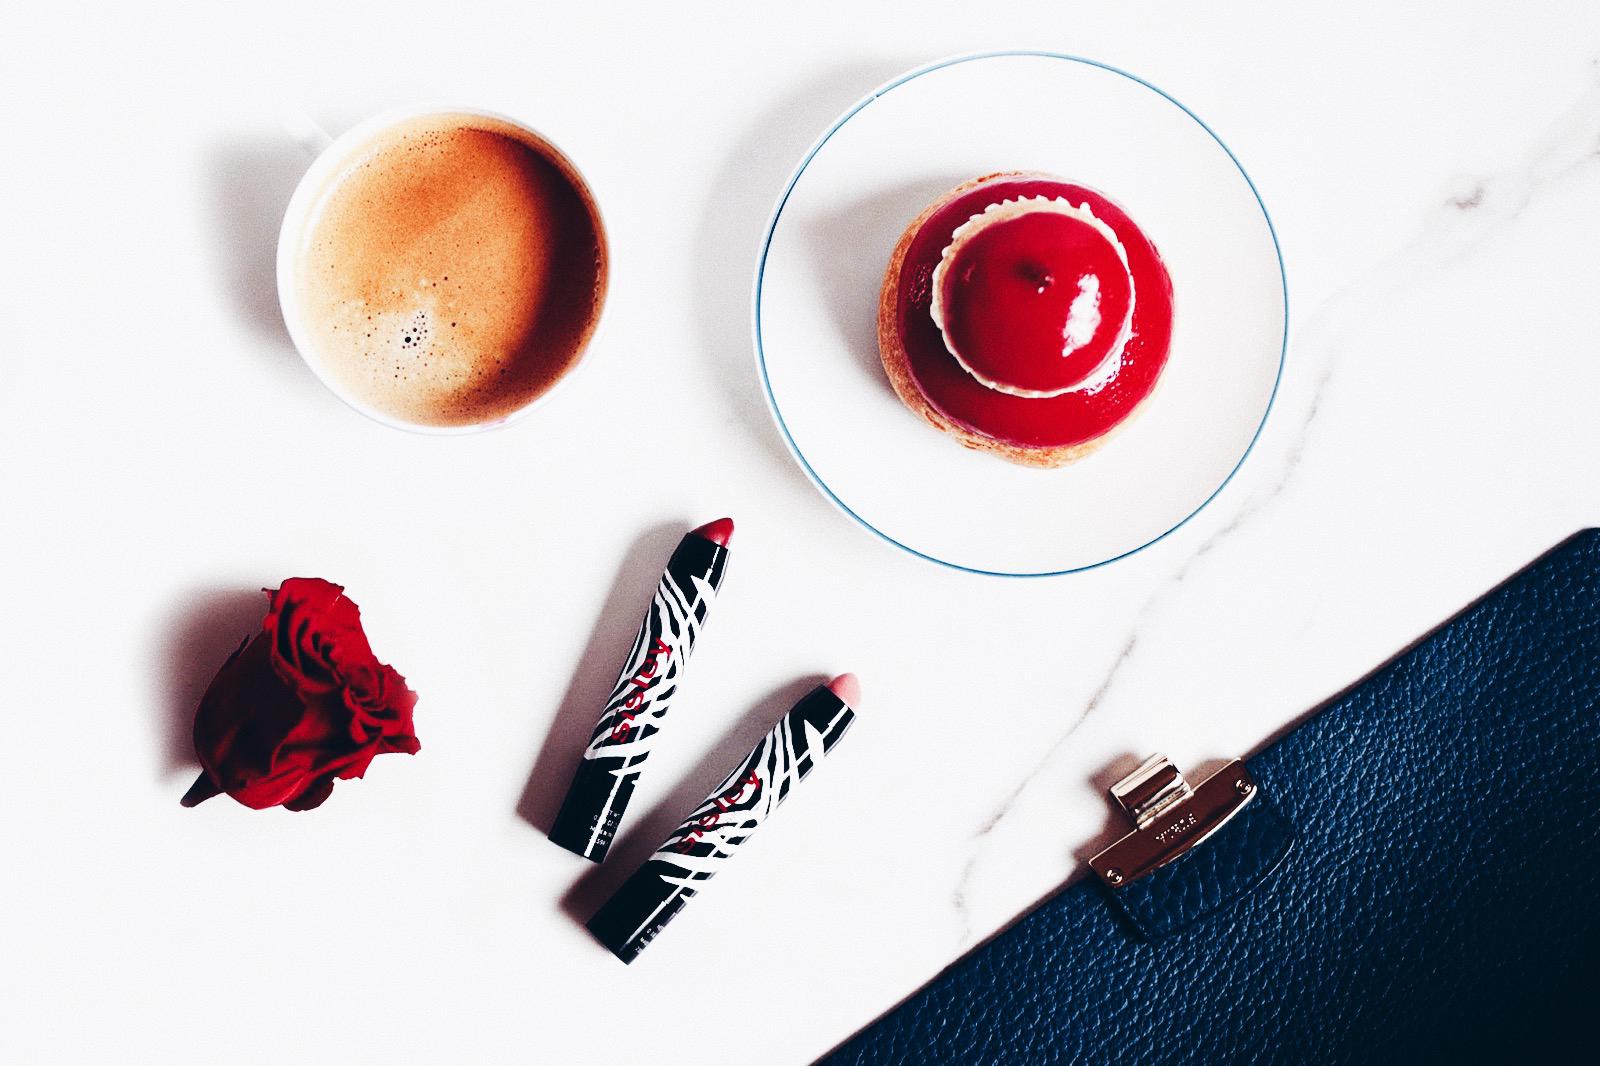 sisley phyto lip twist mat 19 20 21 22 drama ruby ballet burgundy avis test swatch